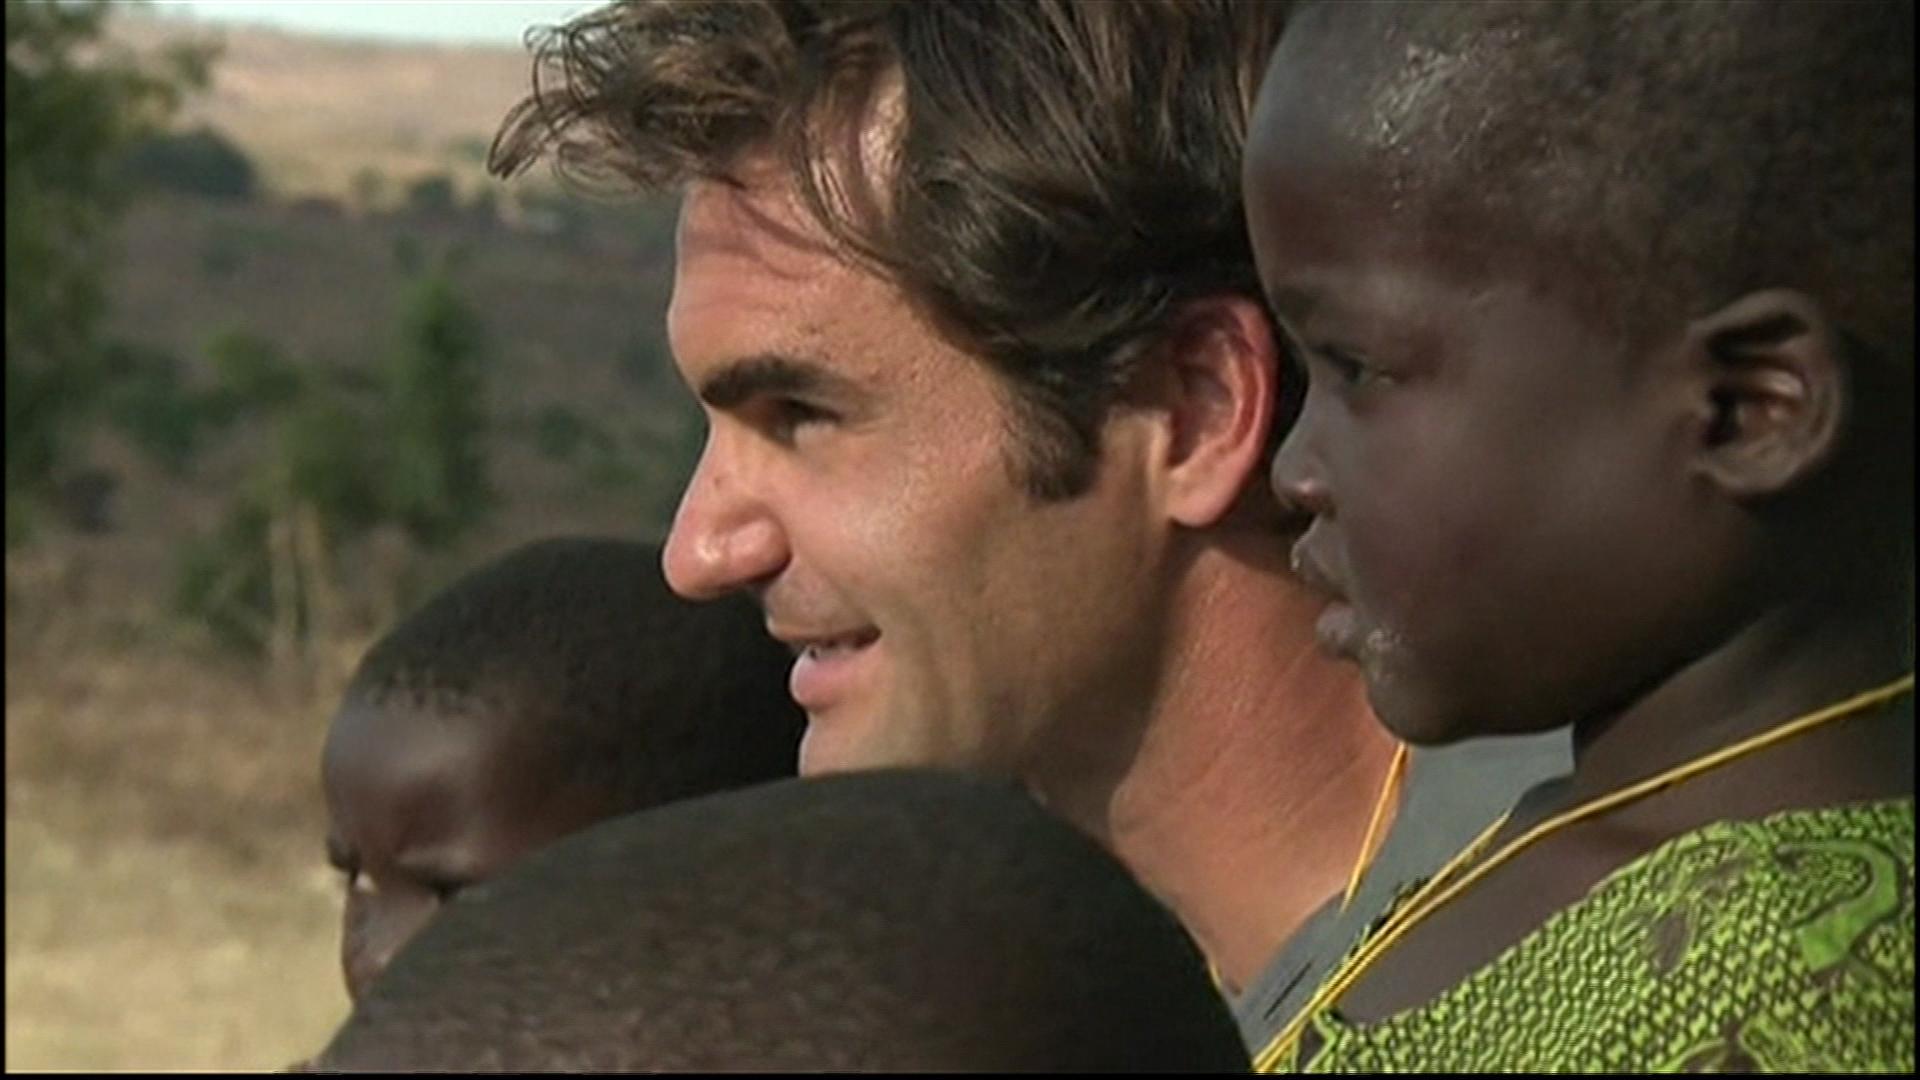 Roger Federer opens Malawi childcare center